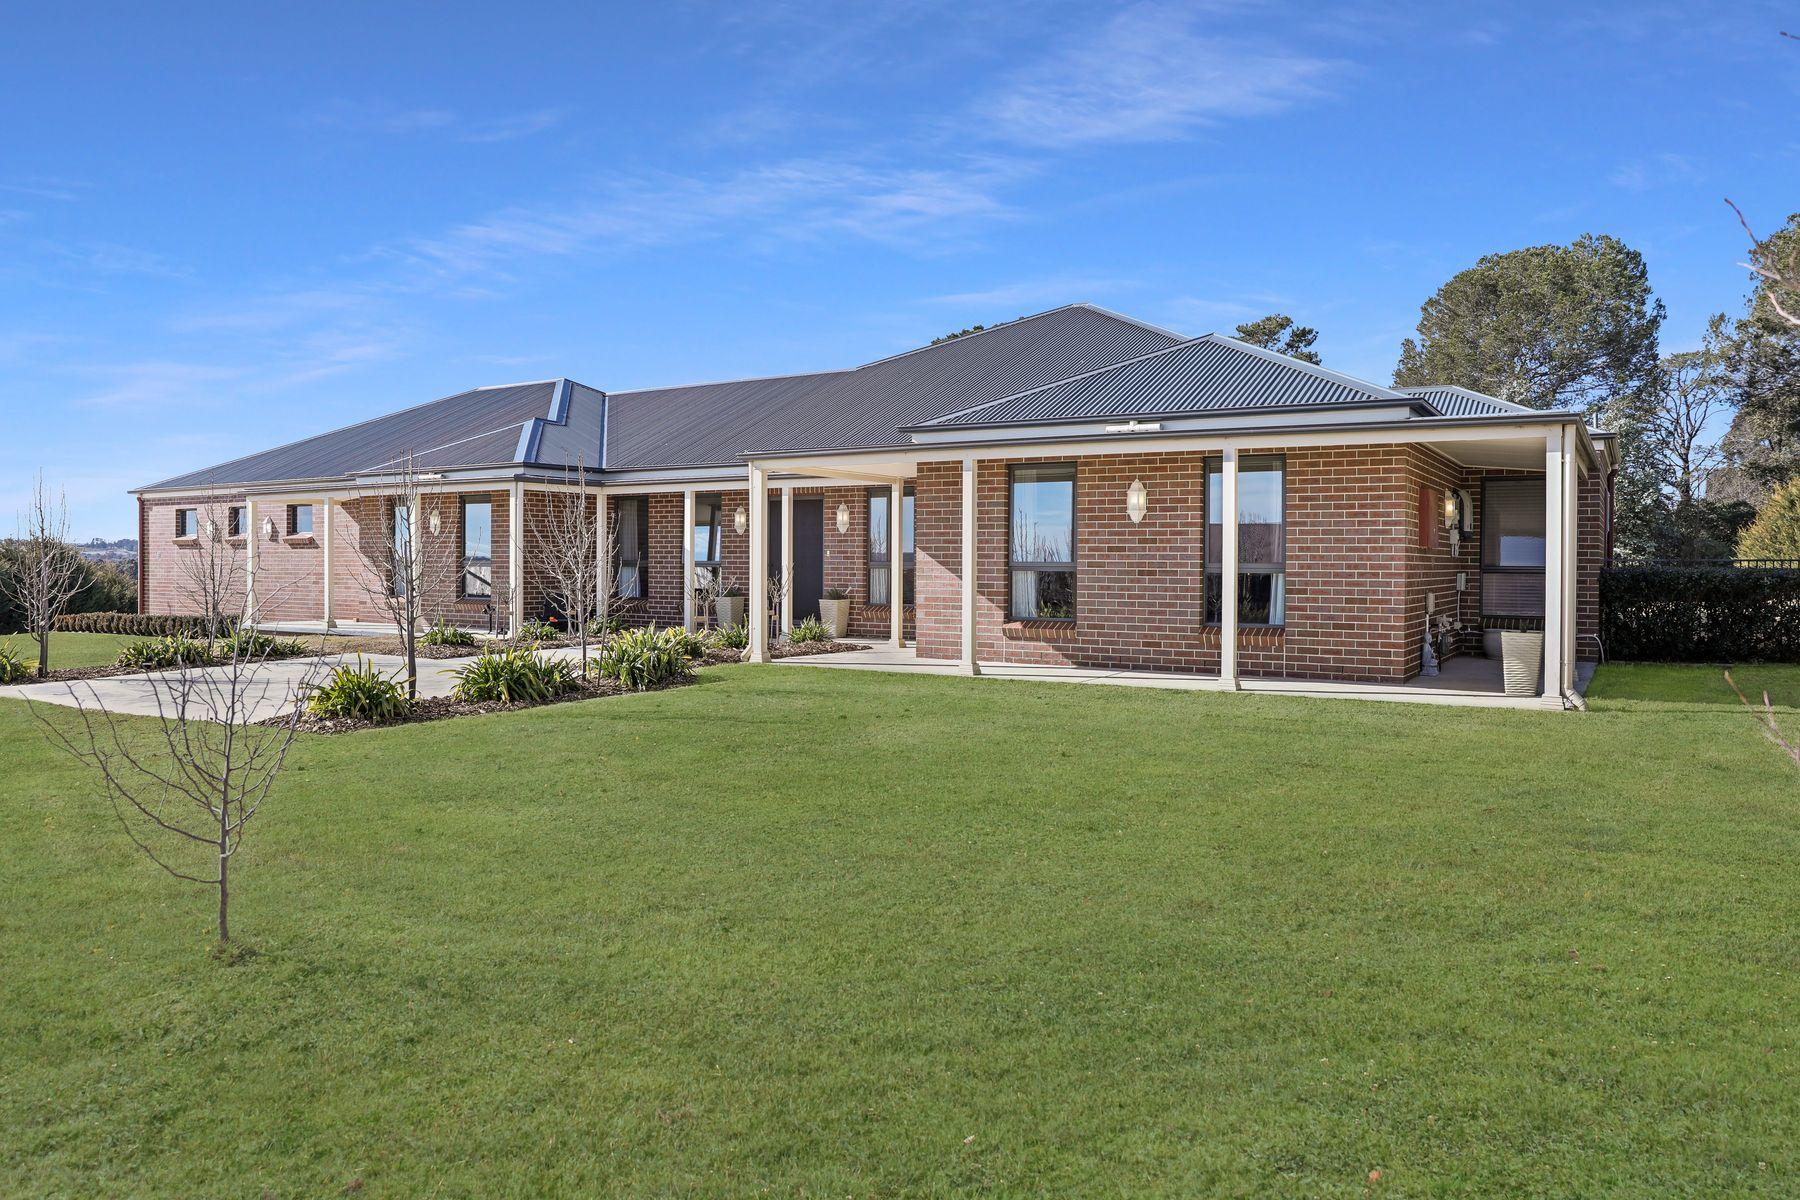 41 Ridgeview Close, White Rock, NSW 2795